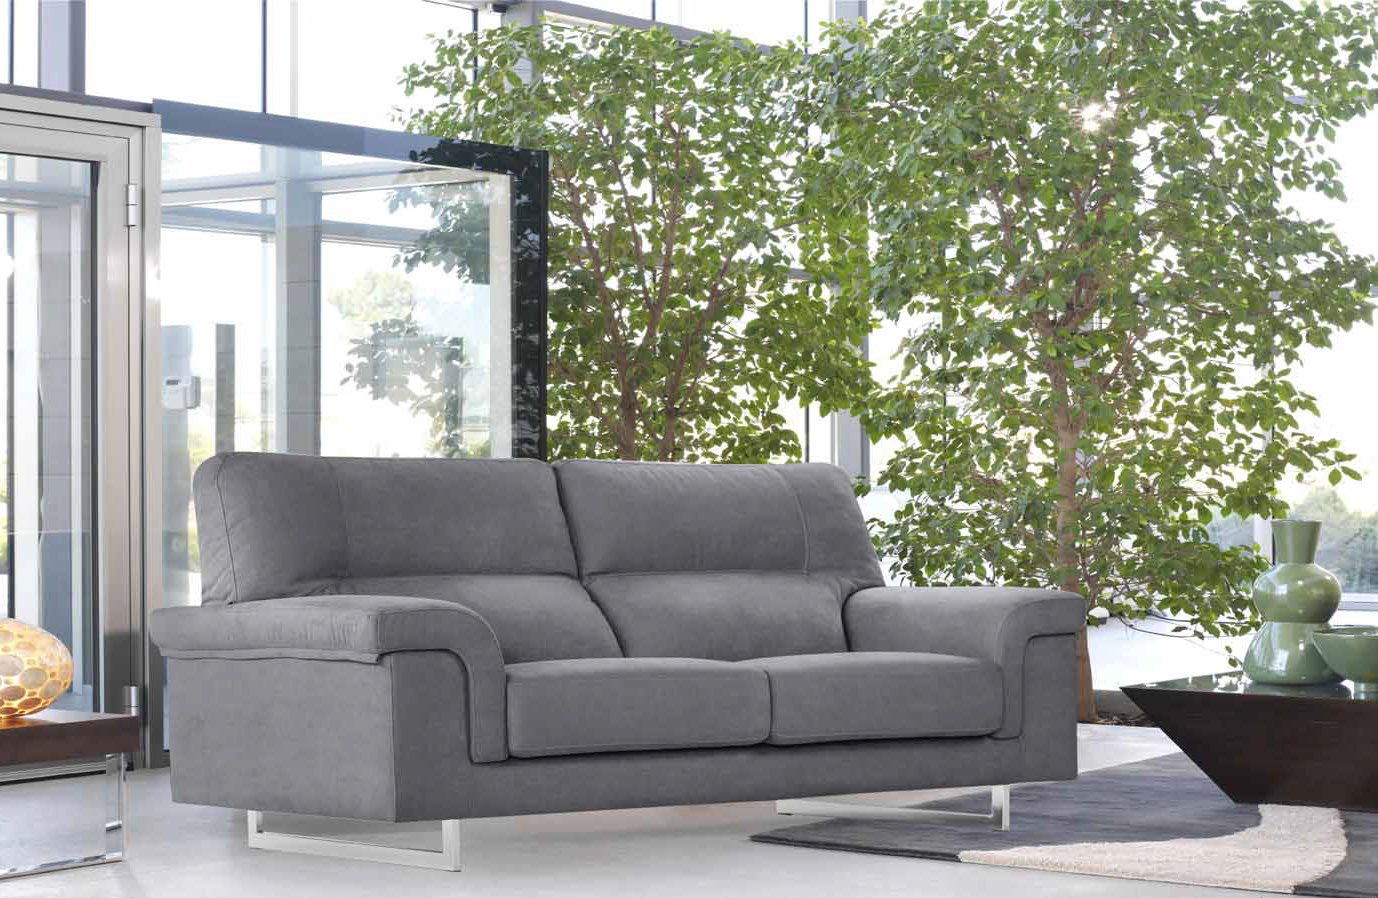 tiendas de sofas en oviedo cheap chaise longue liquidacin